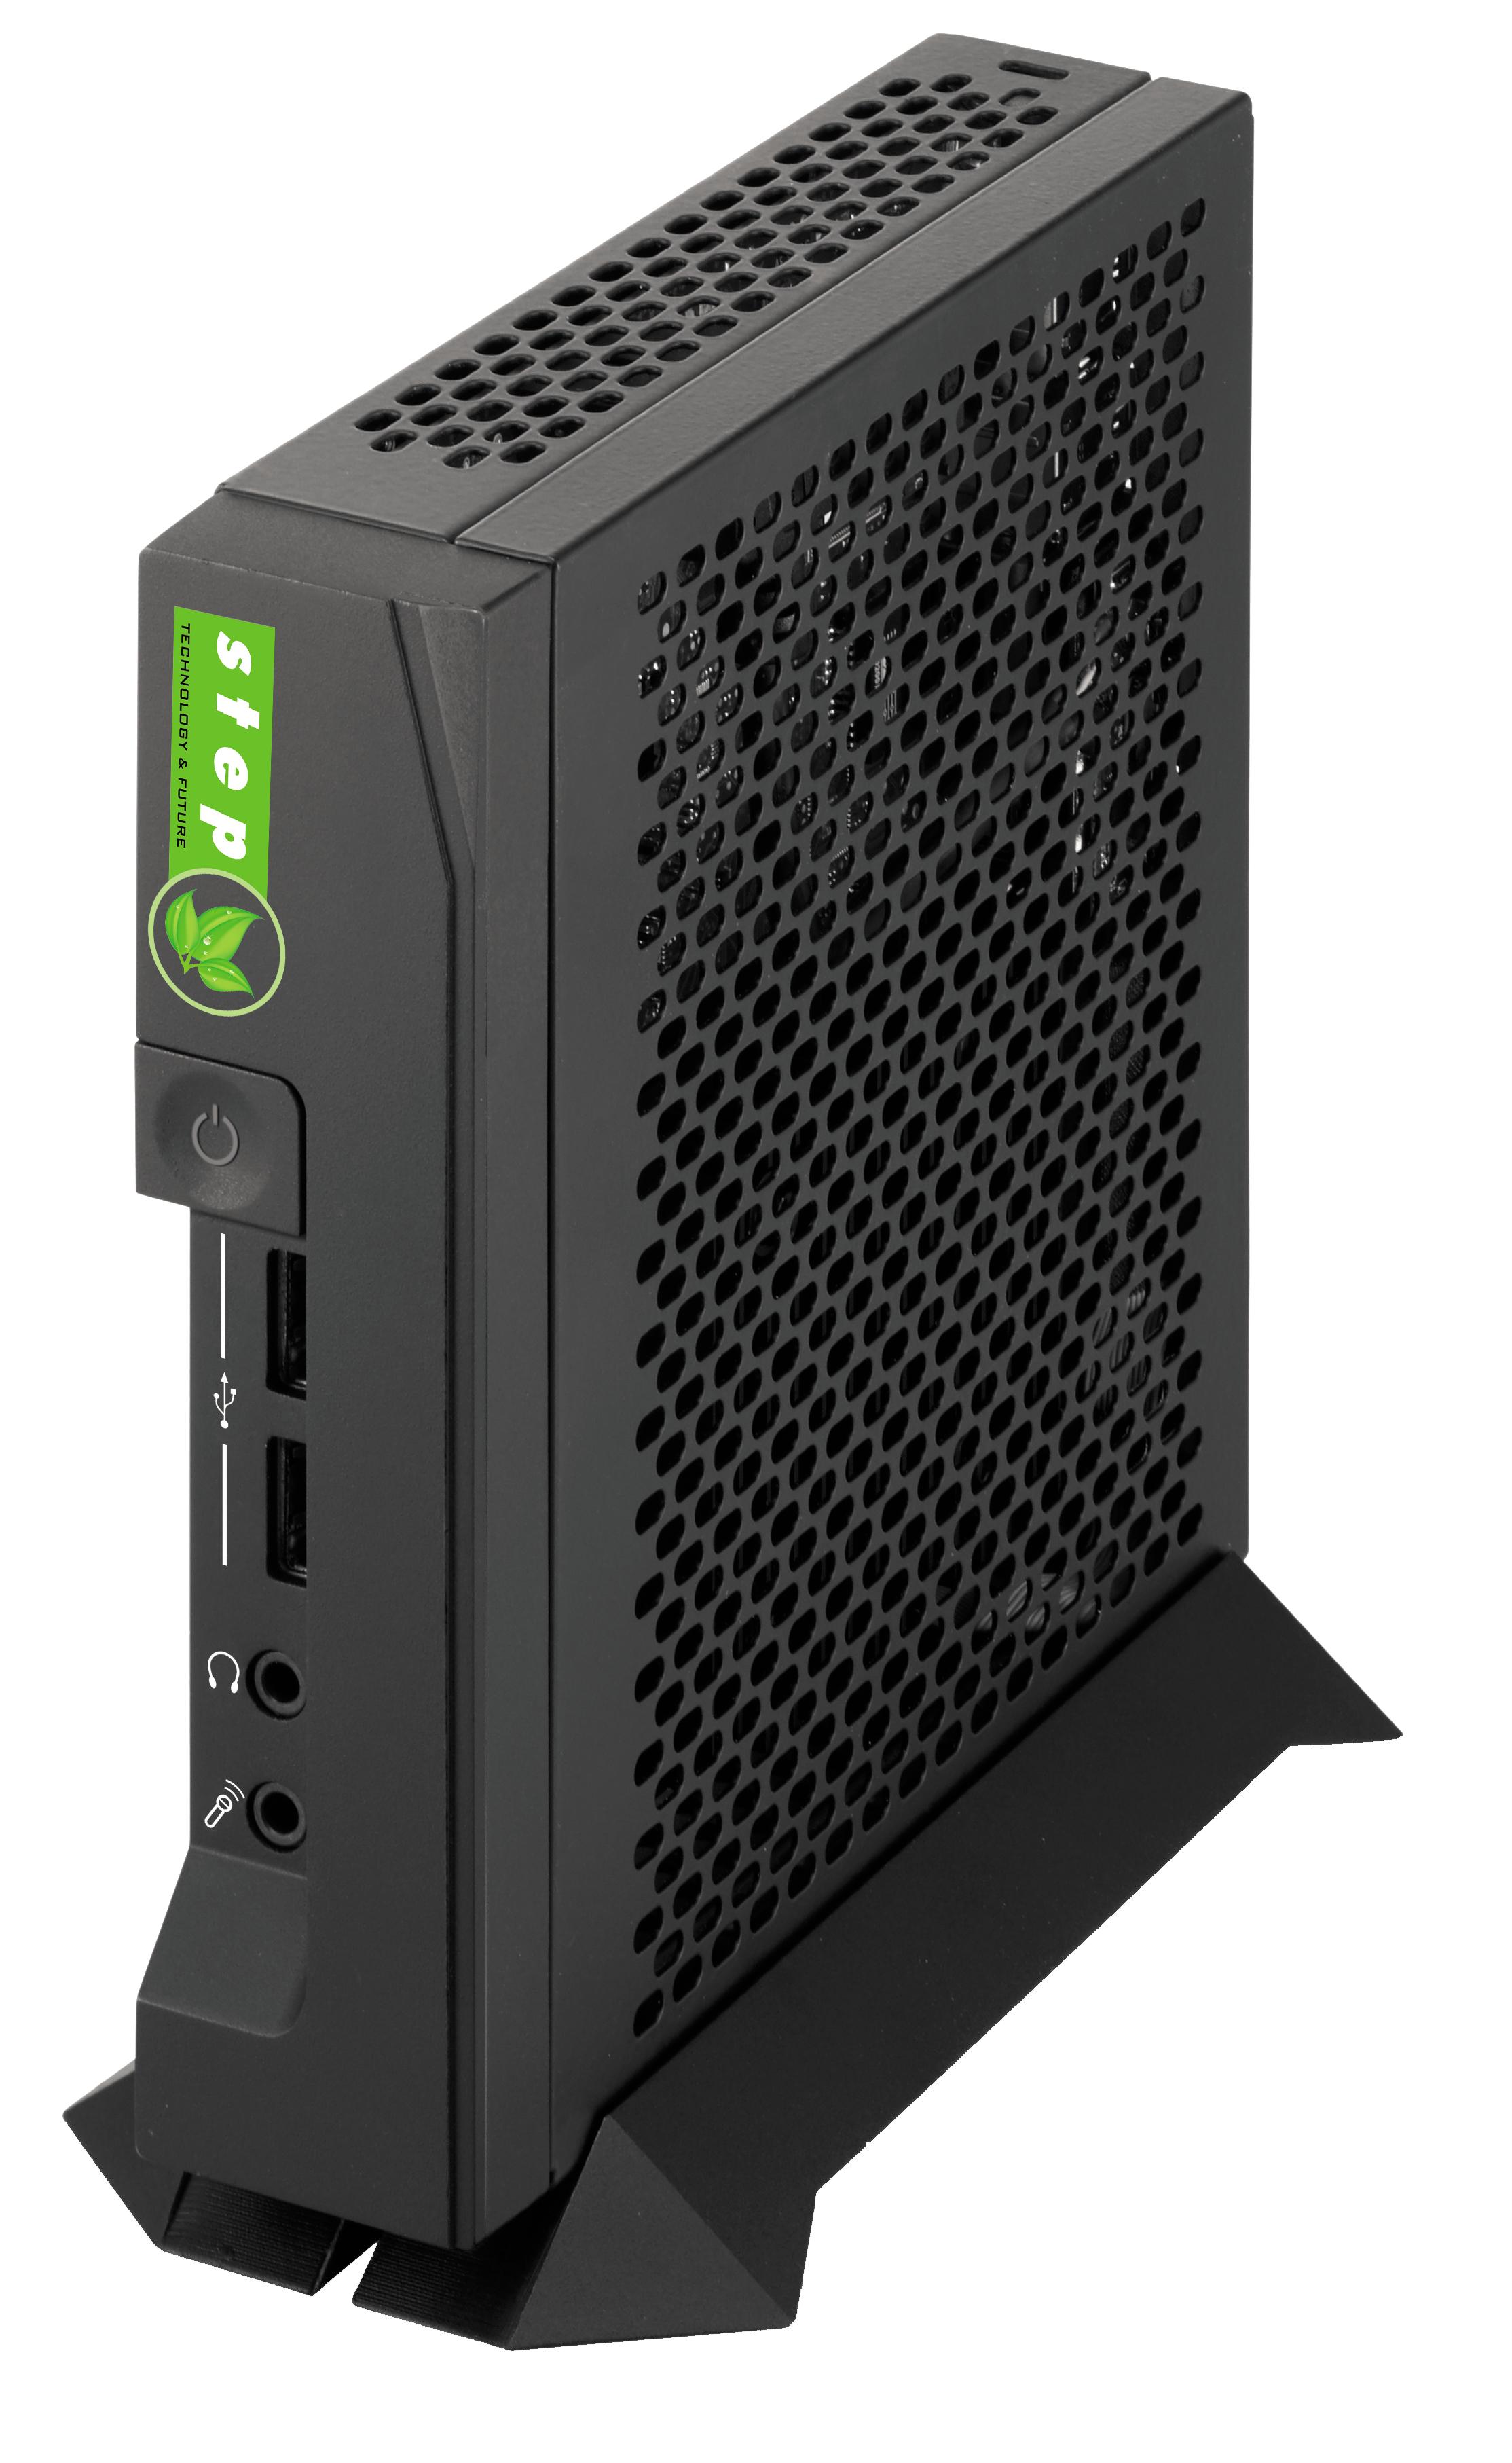 Step Micro DS190P - 1,50 GHz - Intel? Celeron? - J4105 - 8 GB - 250 GB - Windows 10 Pro